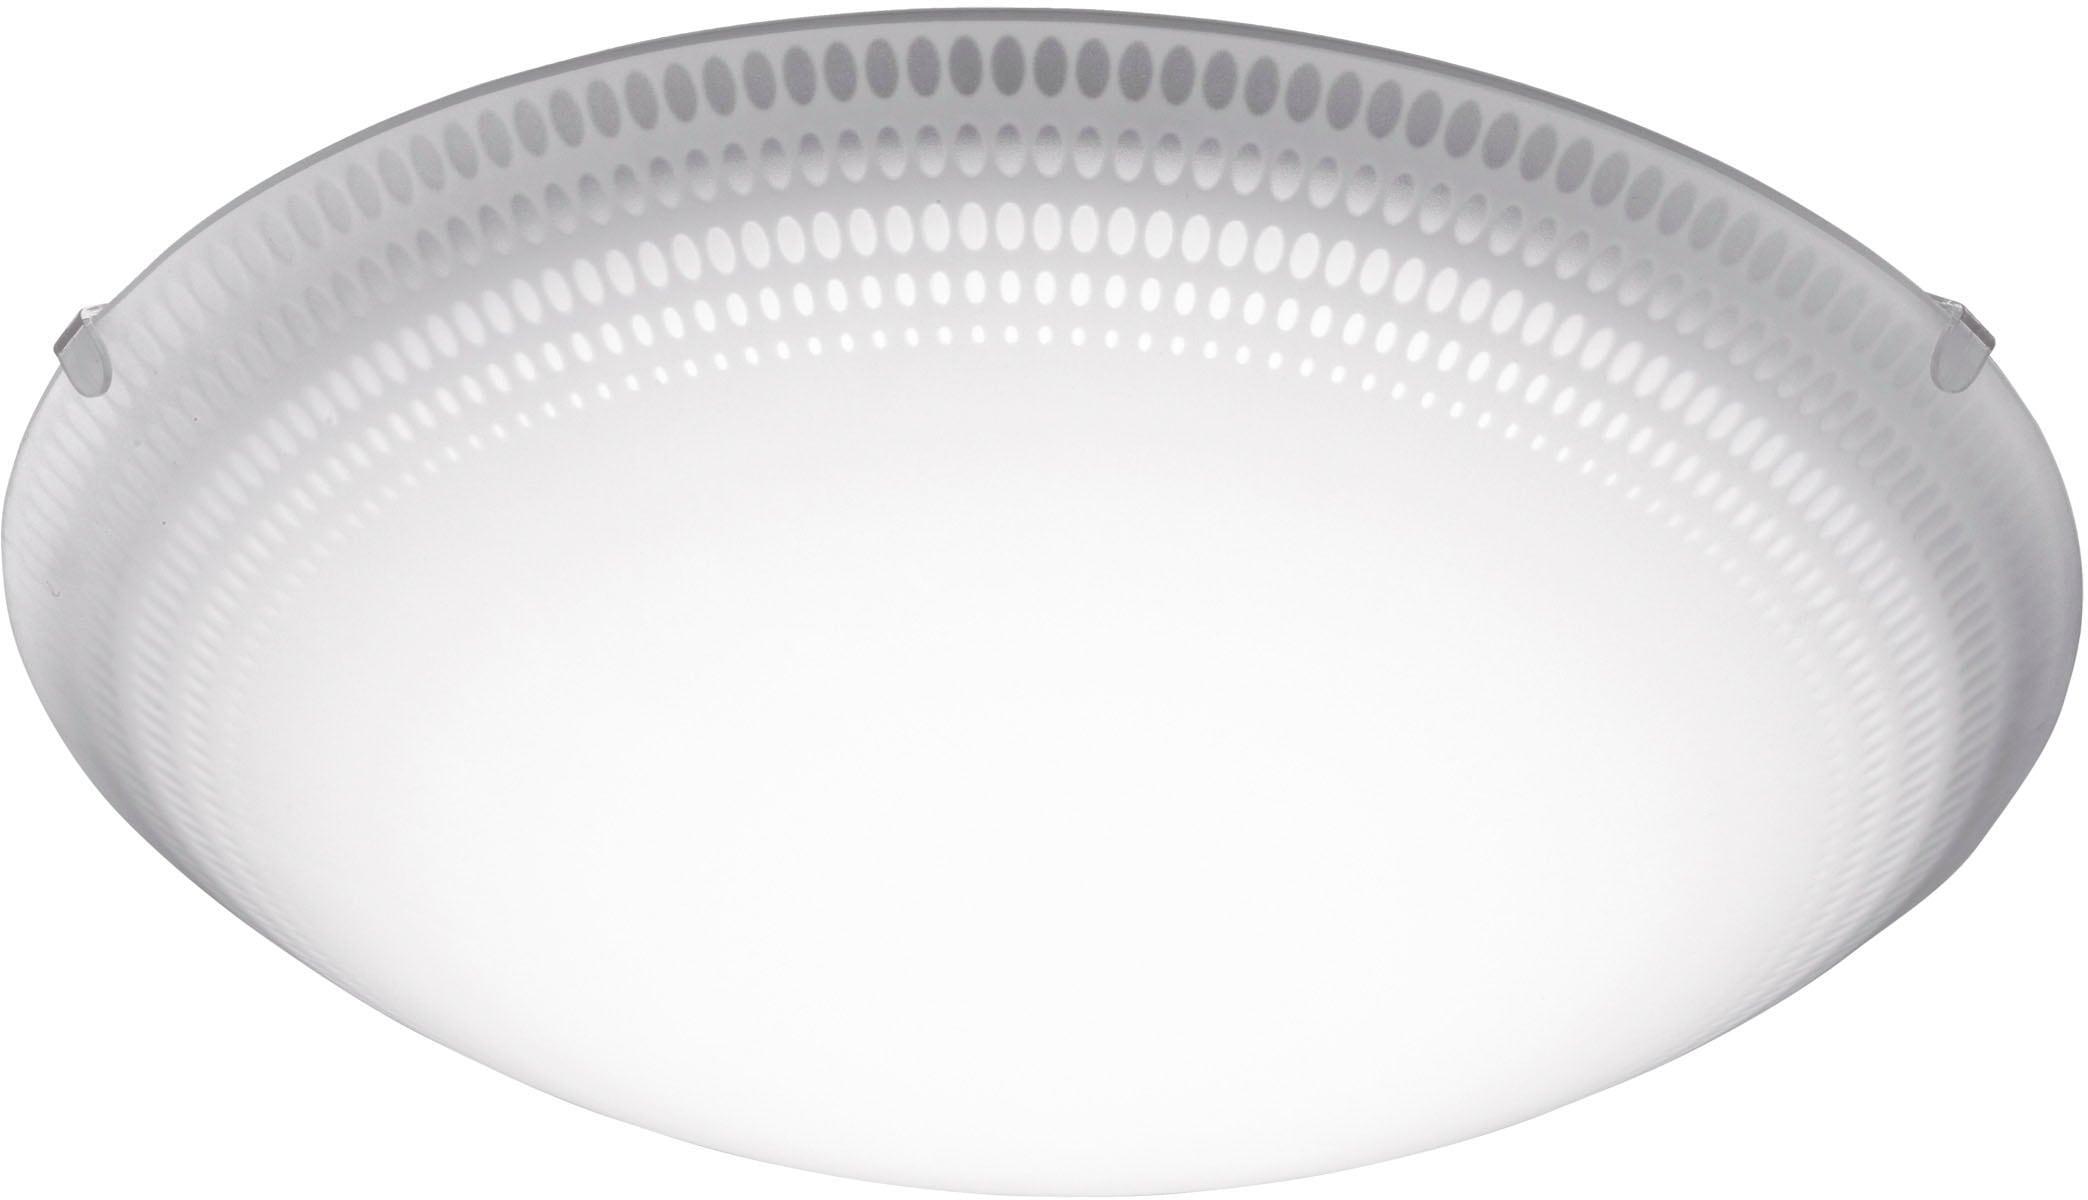 EGLO Deckenleuchte MAGITTA 1, LED-Board, Warmweiß, LED tauschbar